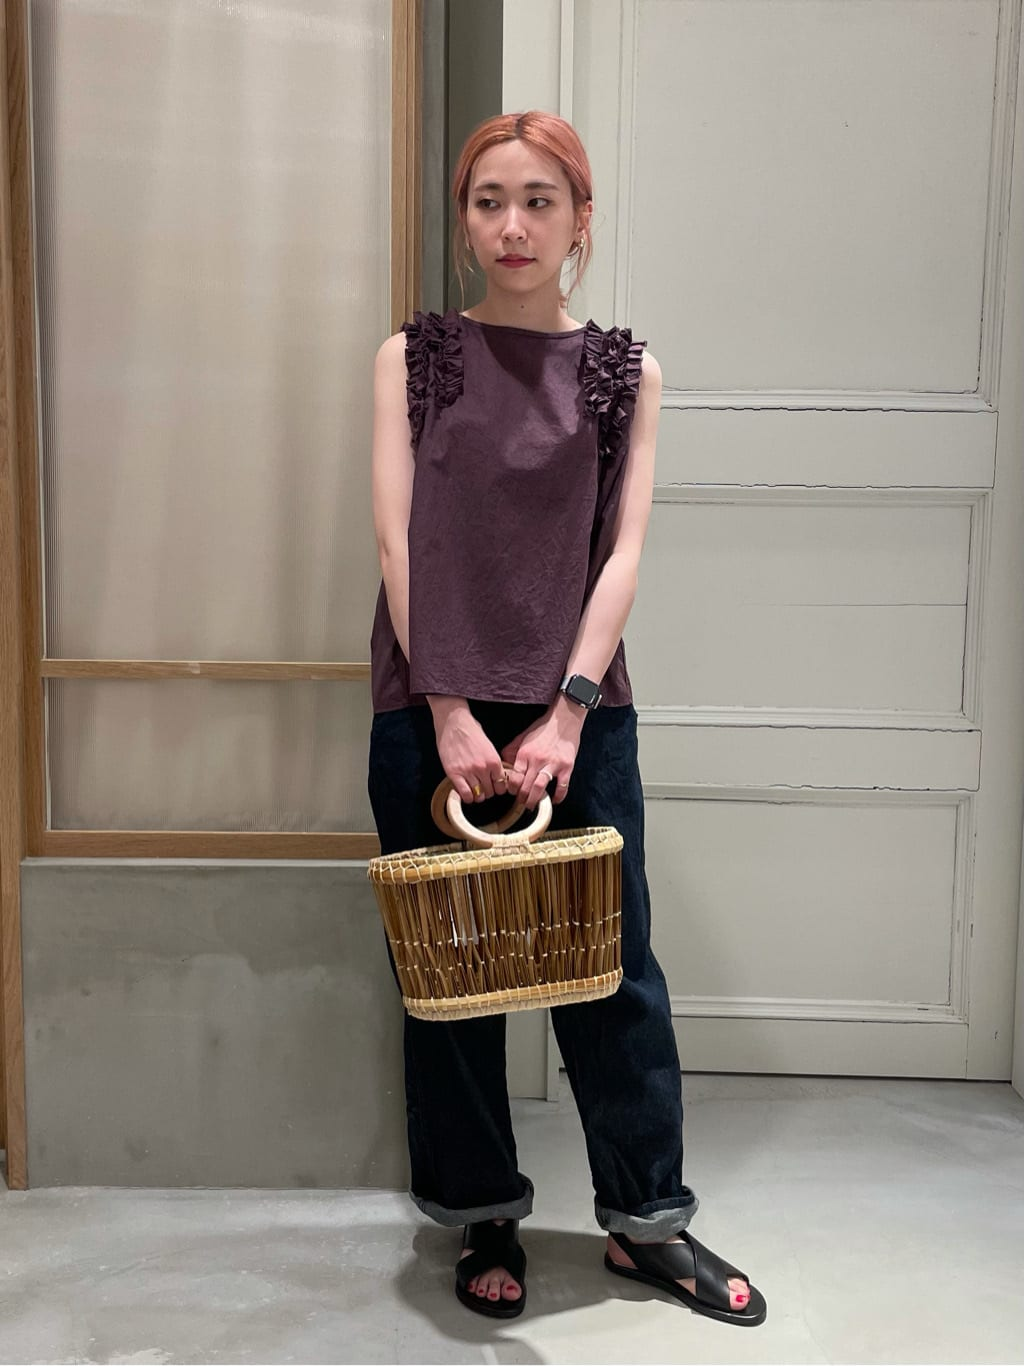 bulle de savon 渋谷スクランブルスクエア 身長:155cm 2021.06.21